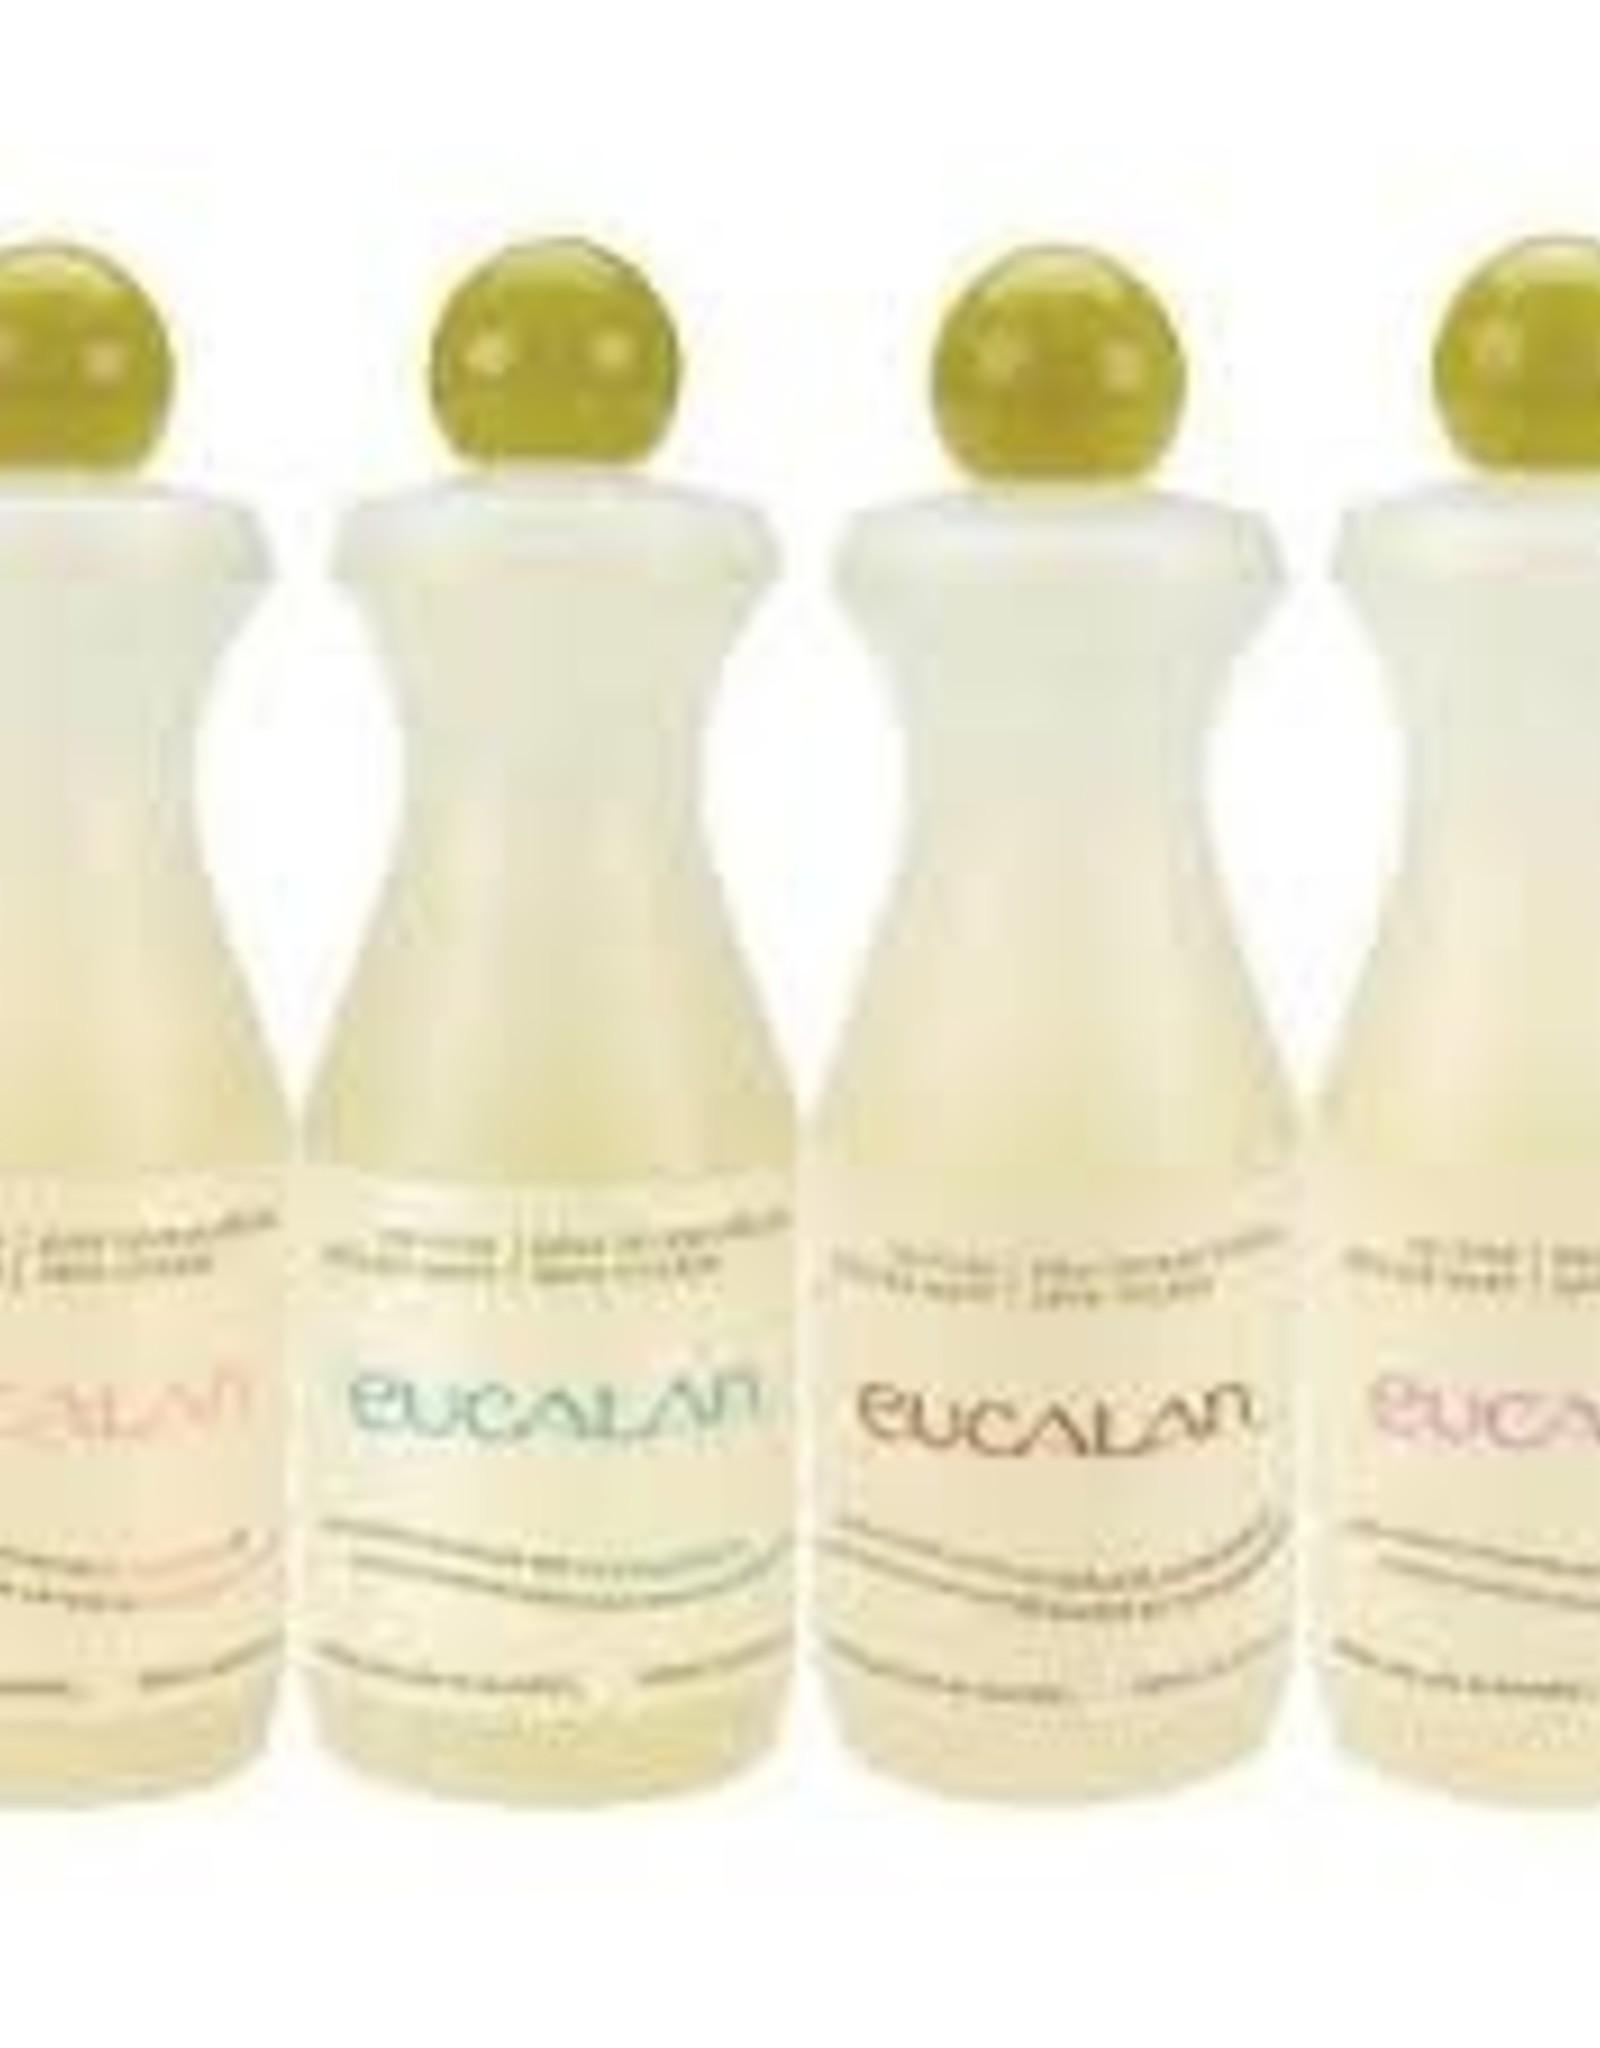 Eucalan 500 ml Unscented